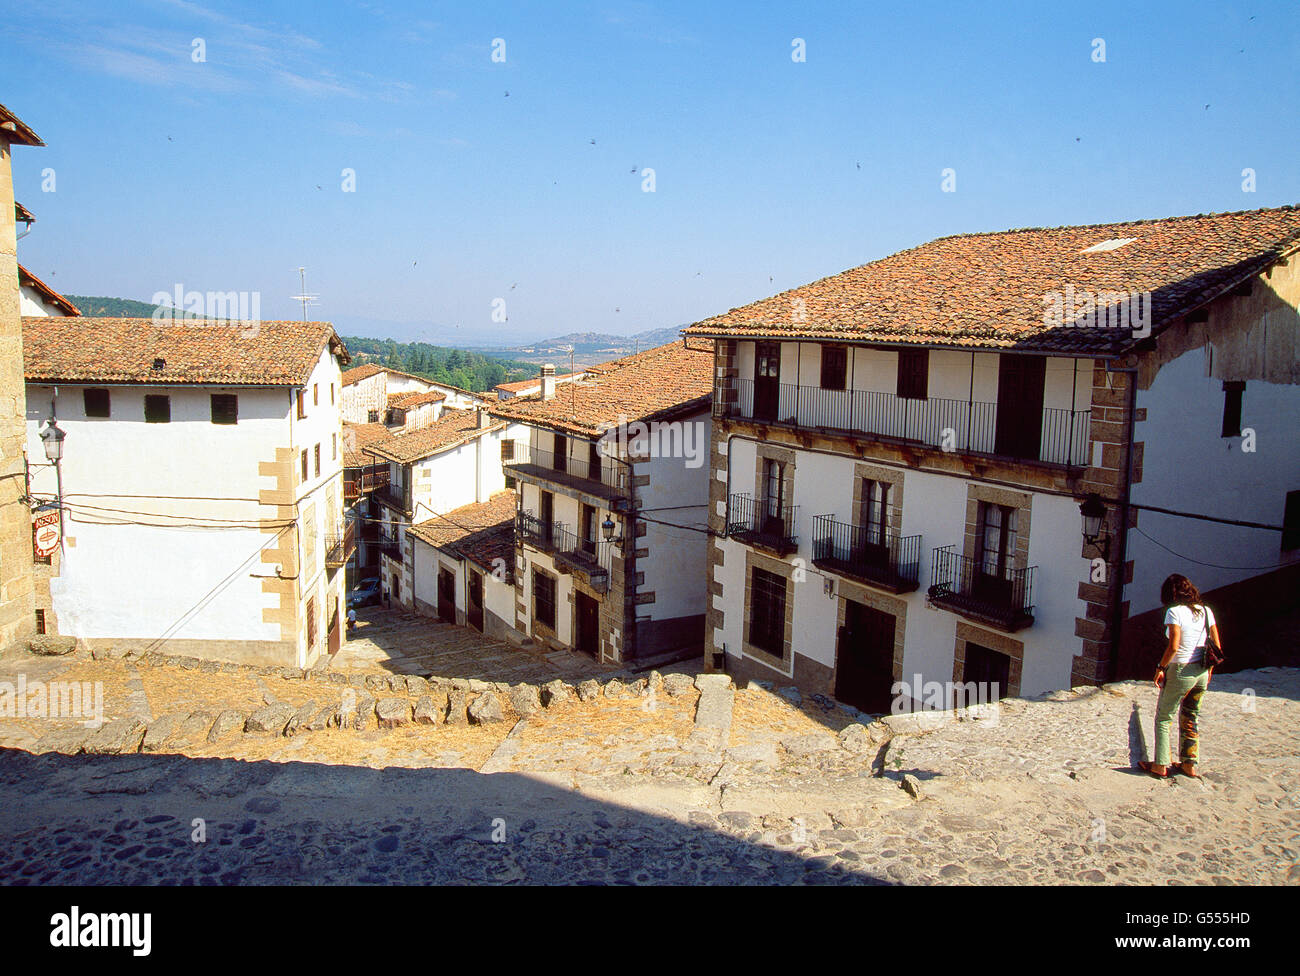 Straße. Candelario, Salamanca Provinz Kastilien-Leon, Spanien. Stockbild